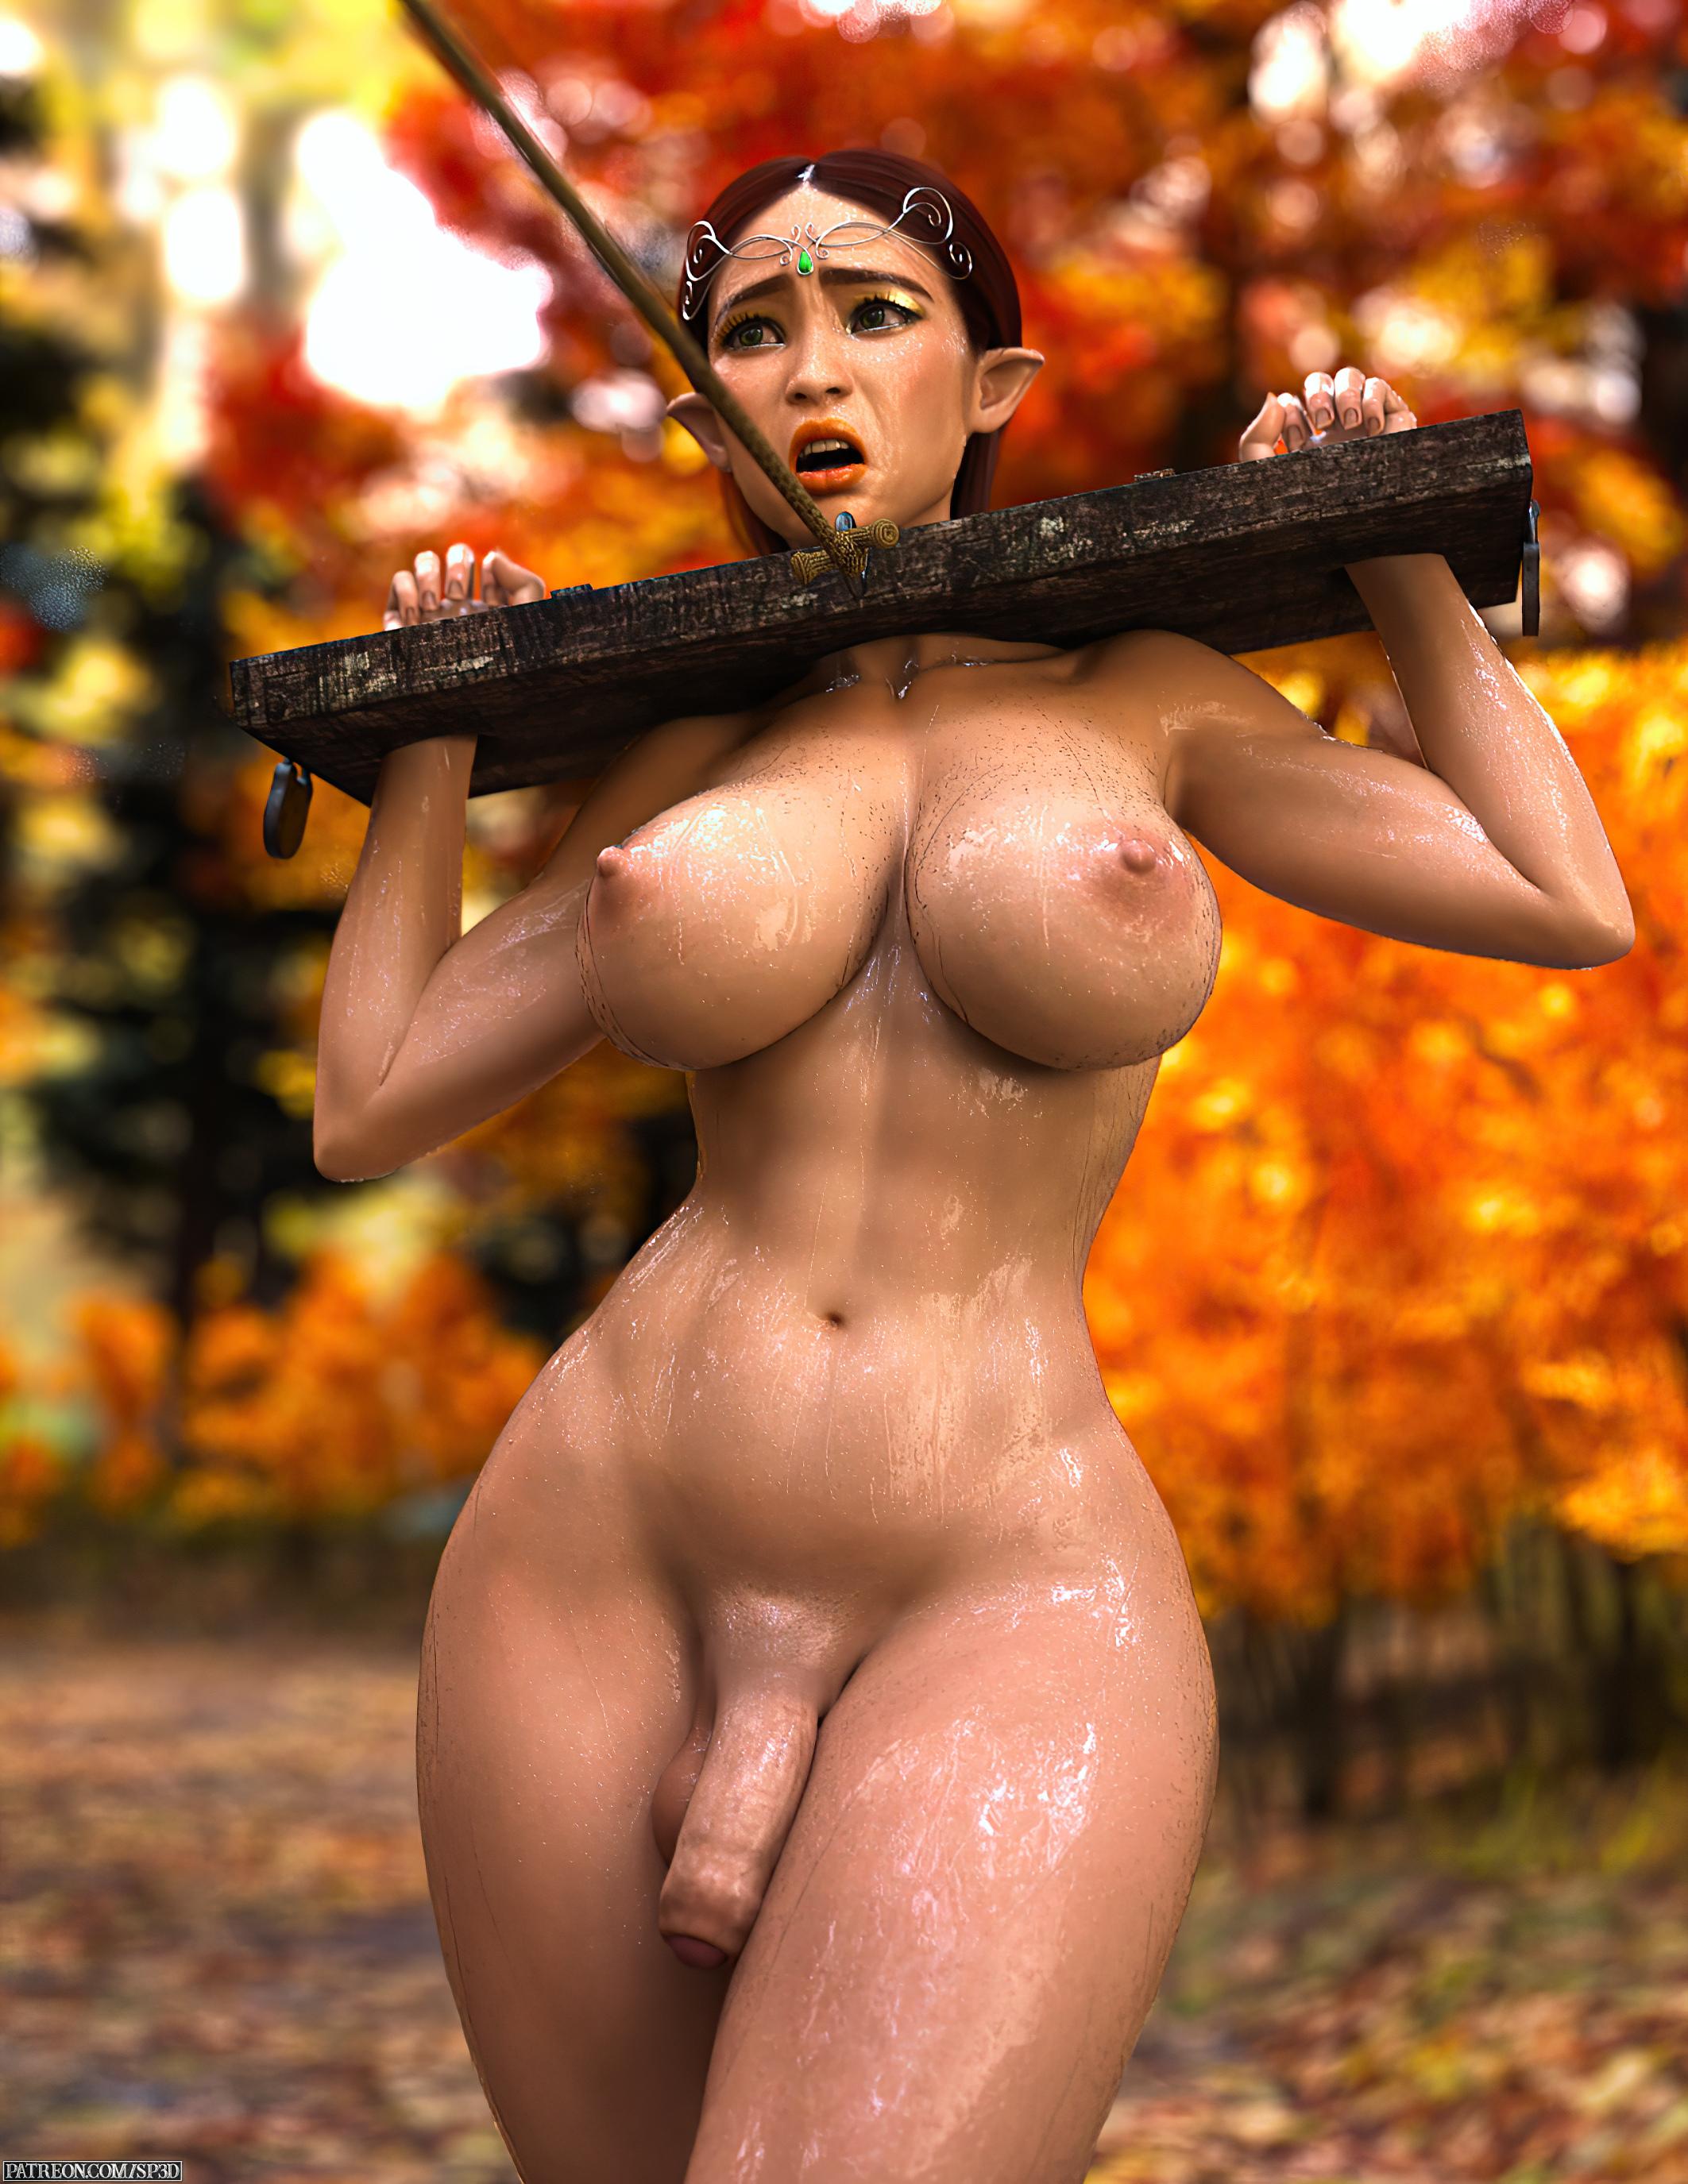 Wood Elf's New Toys